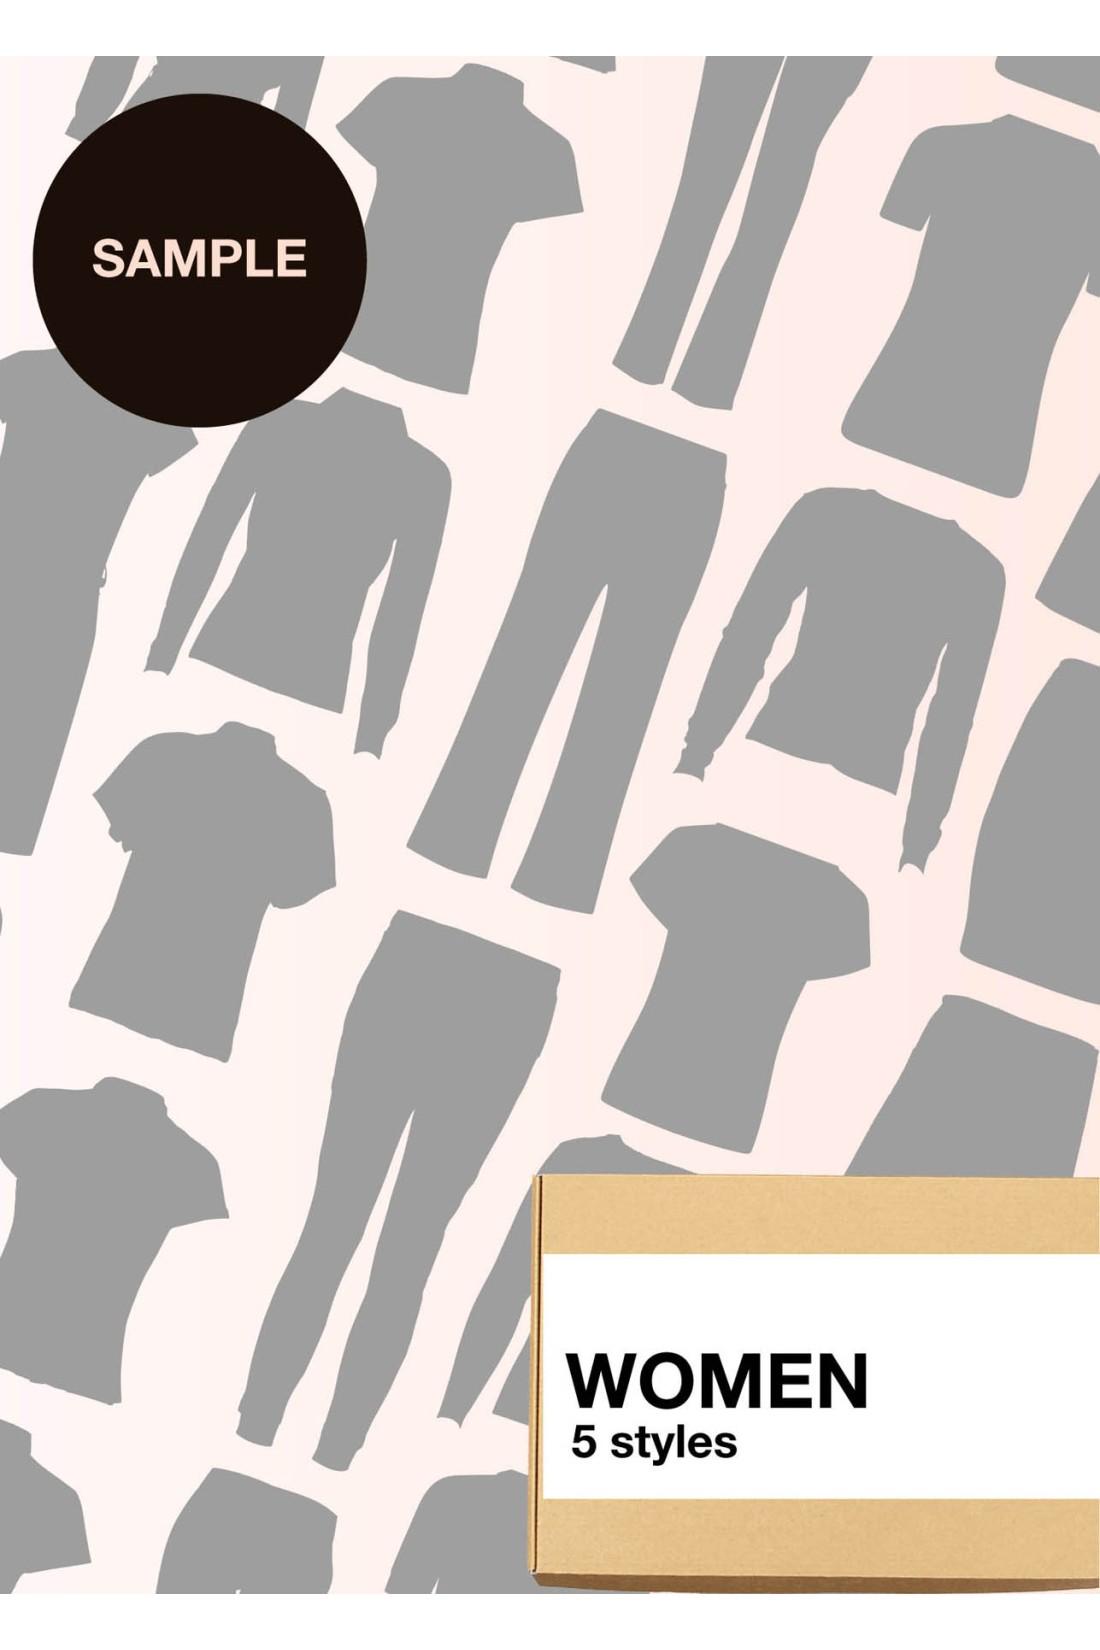 Sample Surprise Box Women - 5 Styles